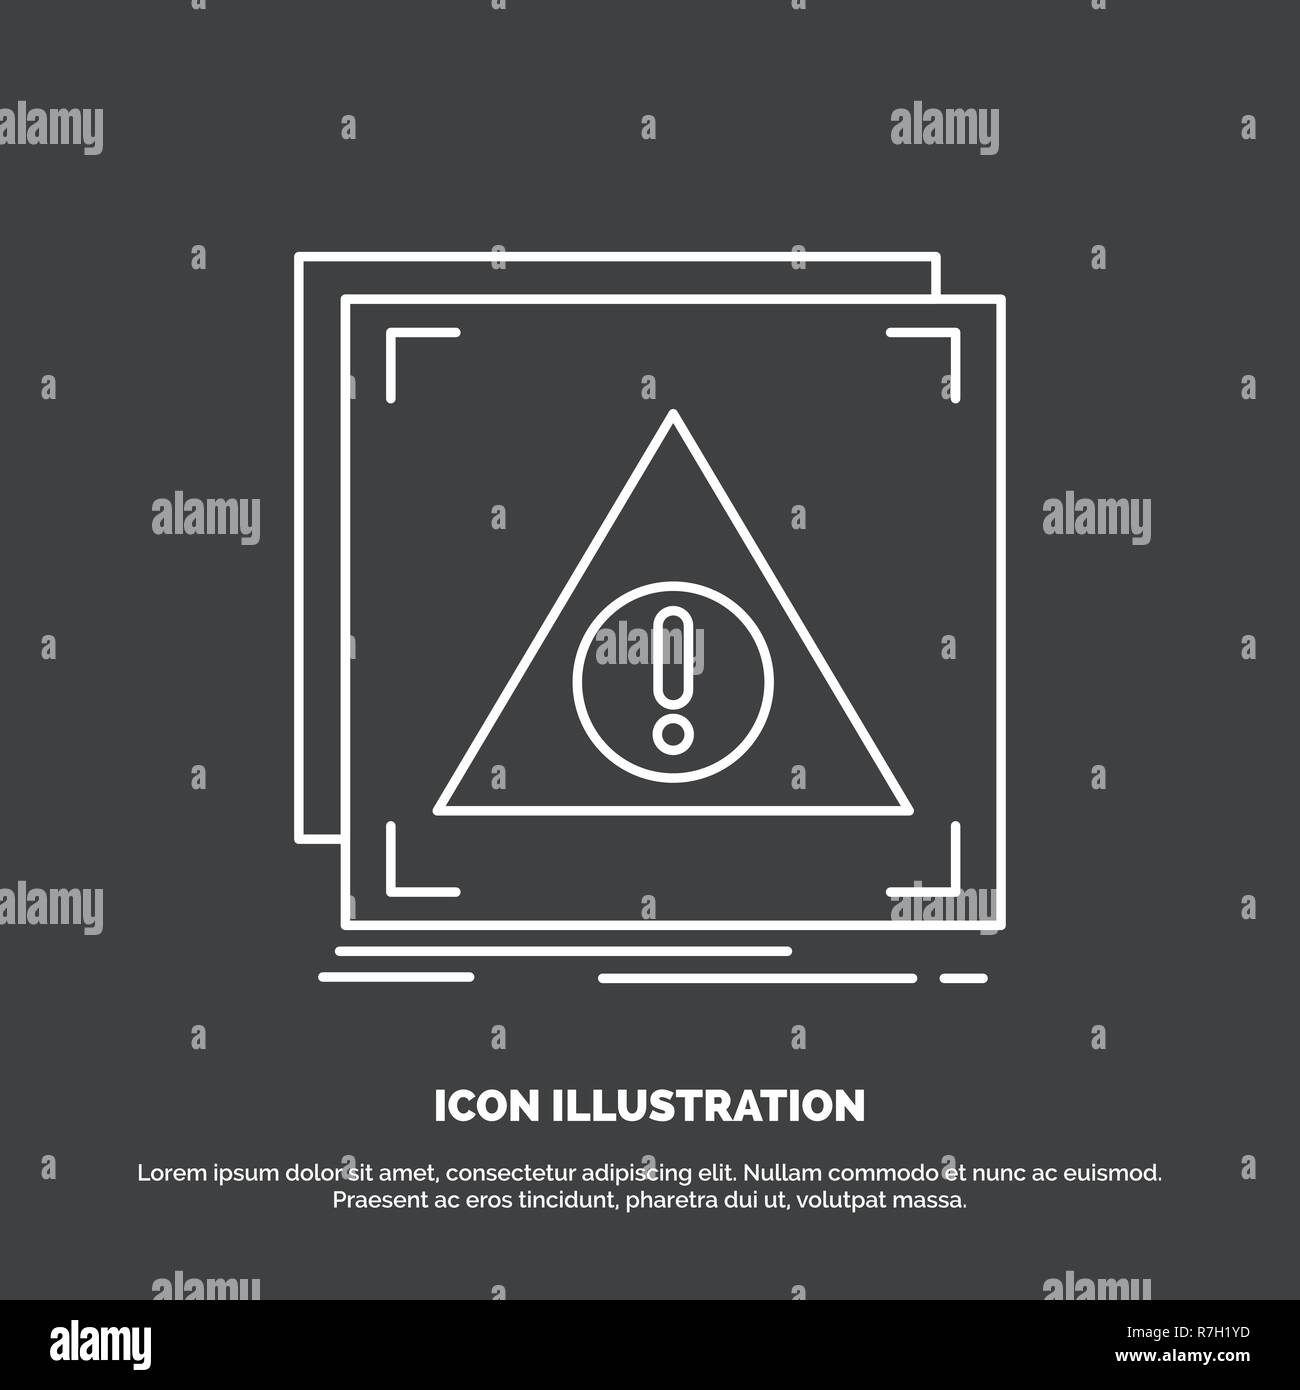 Error, Application, Denied, server, alert Icon. Line vector symbol for UI and UX, website or mobile application - Stock Image